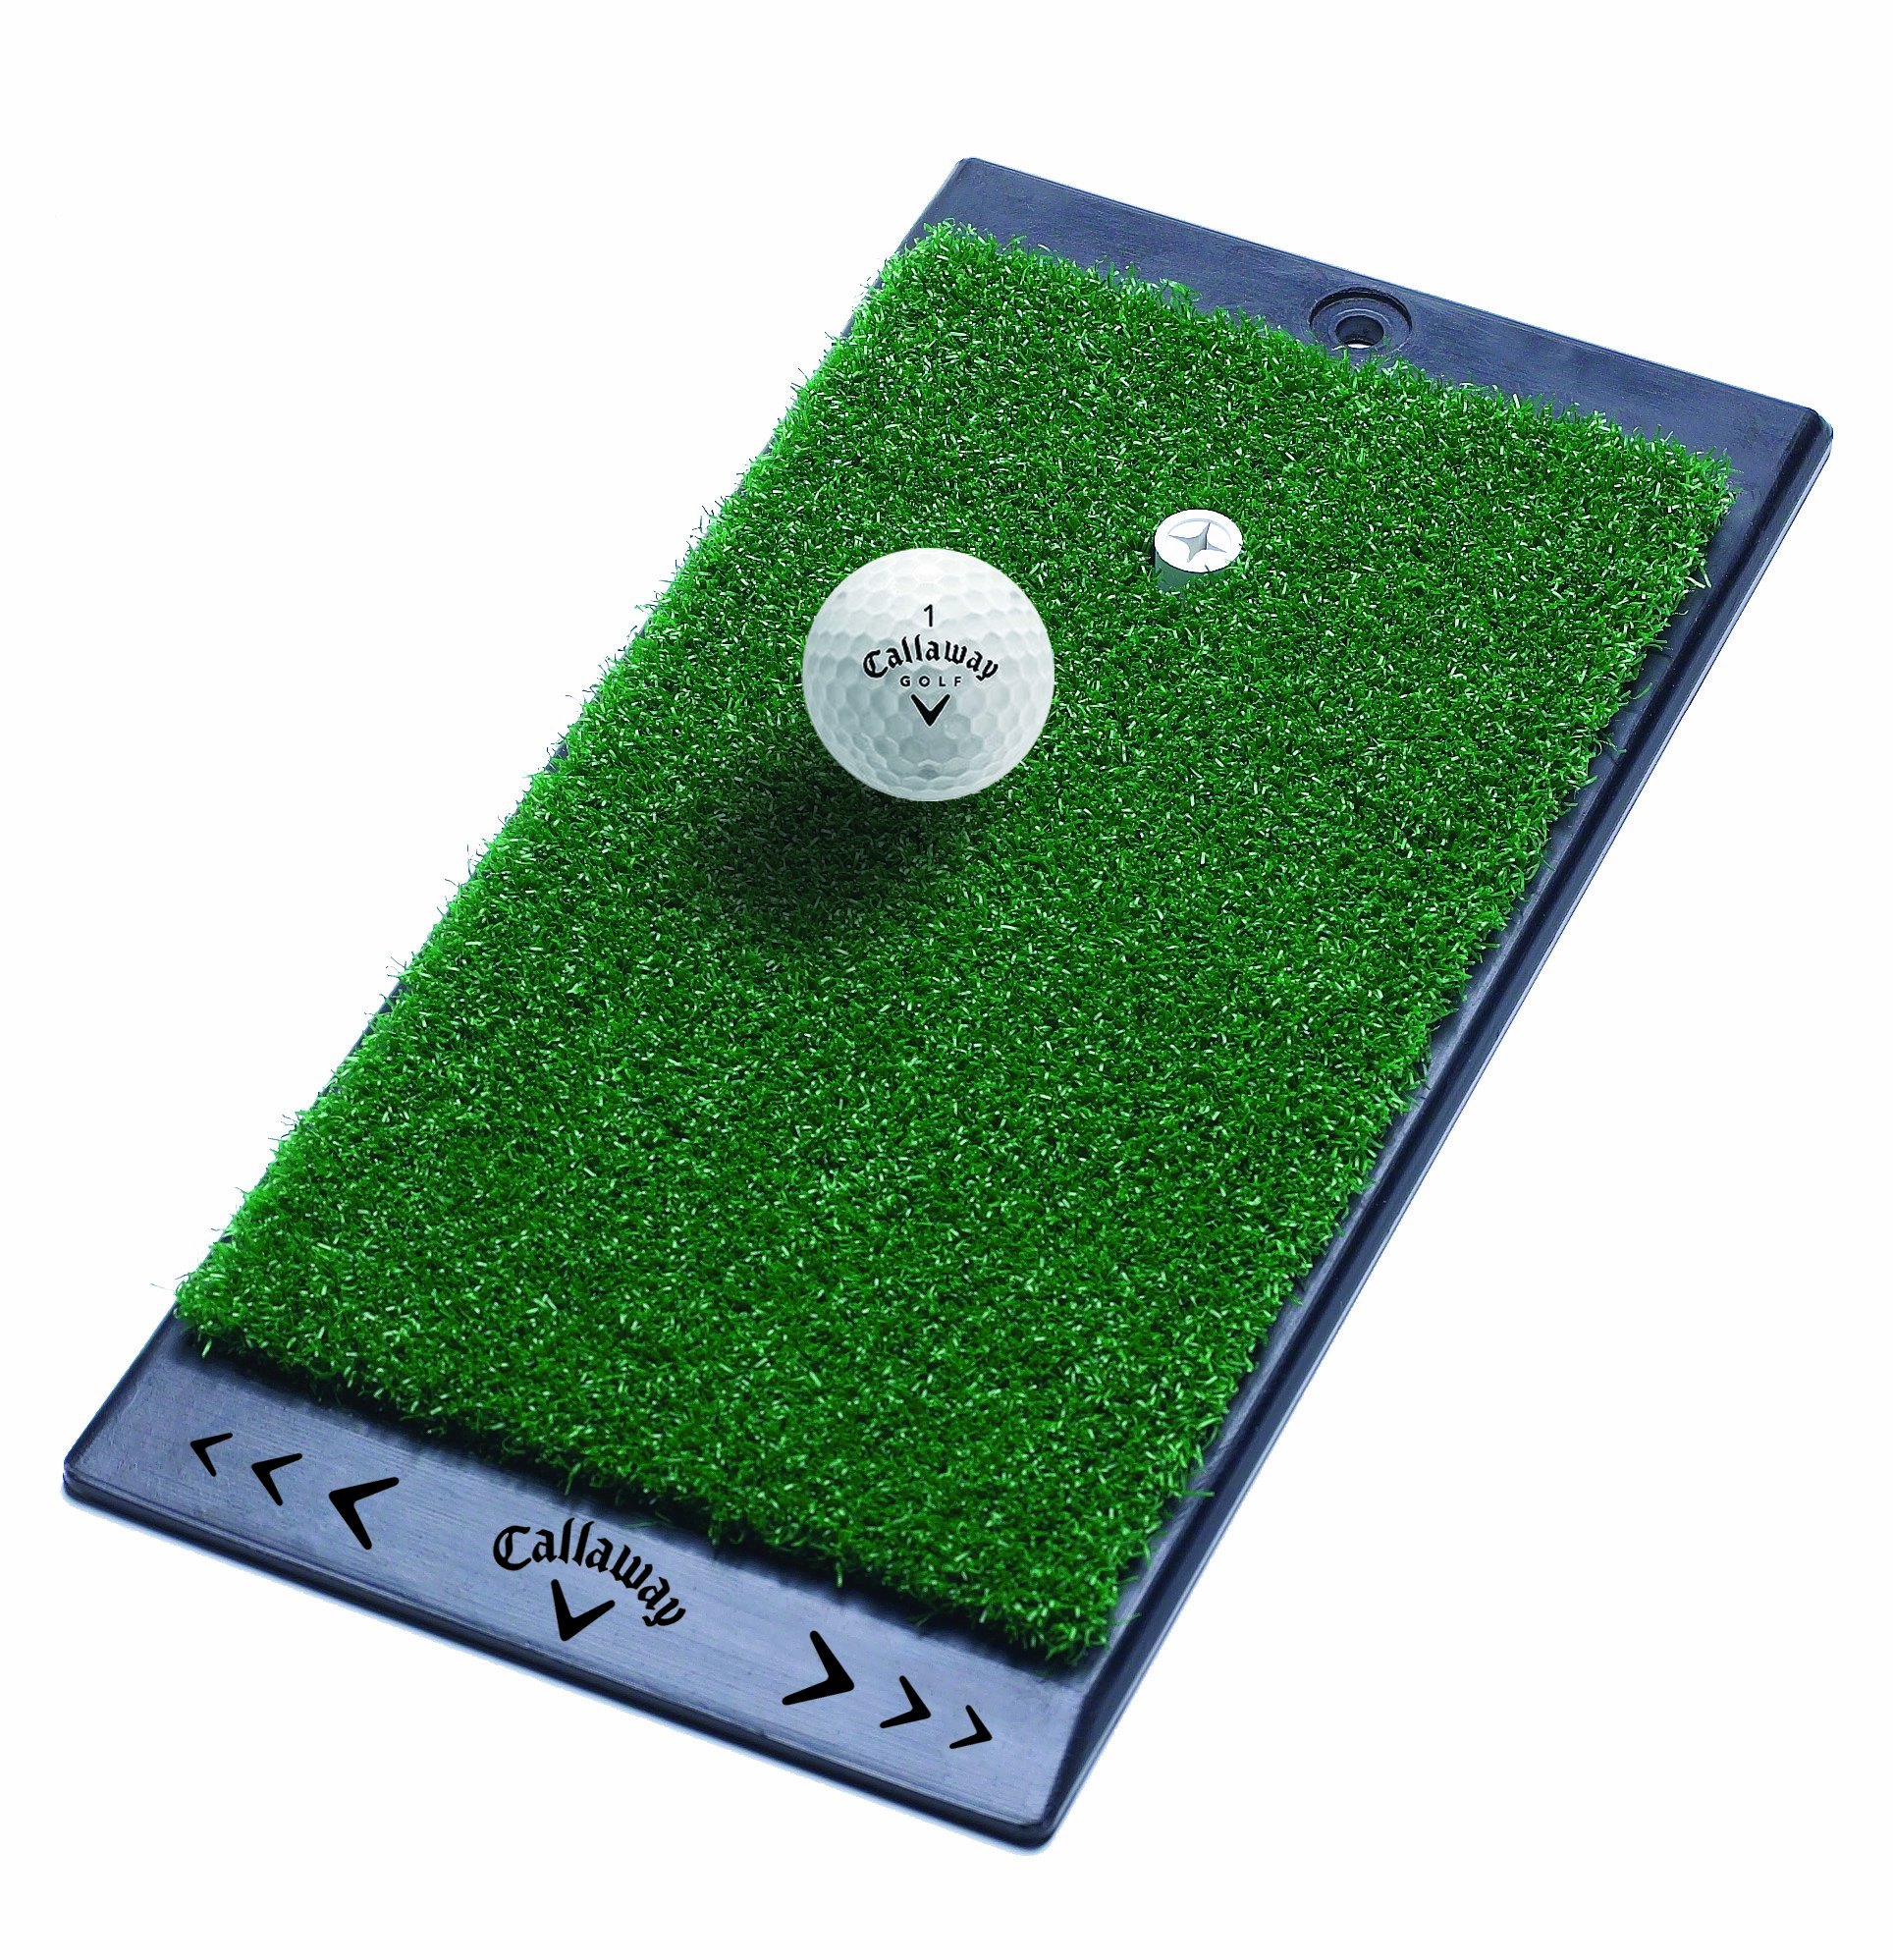 Callaway Golf FT Launch Zone Hitting Mat by Callaway